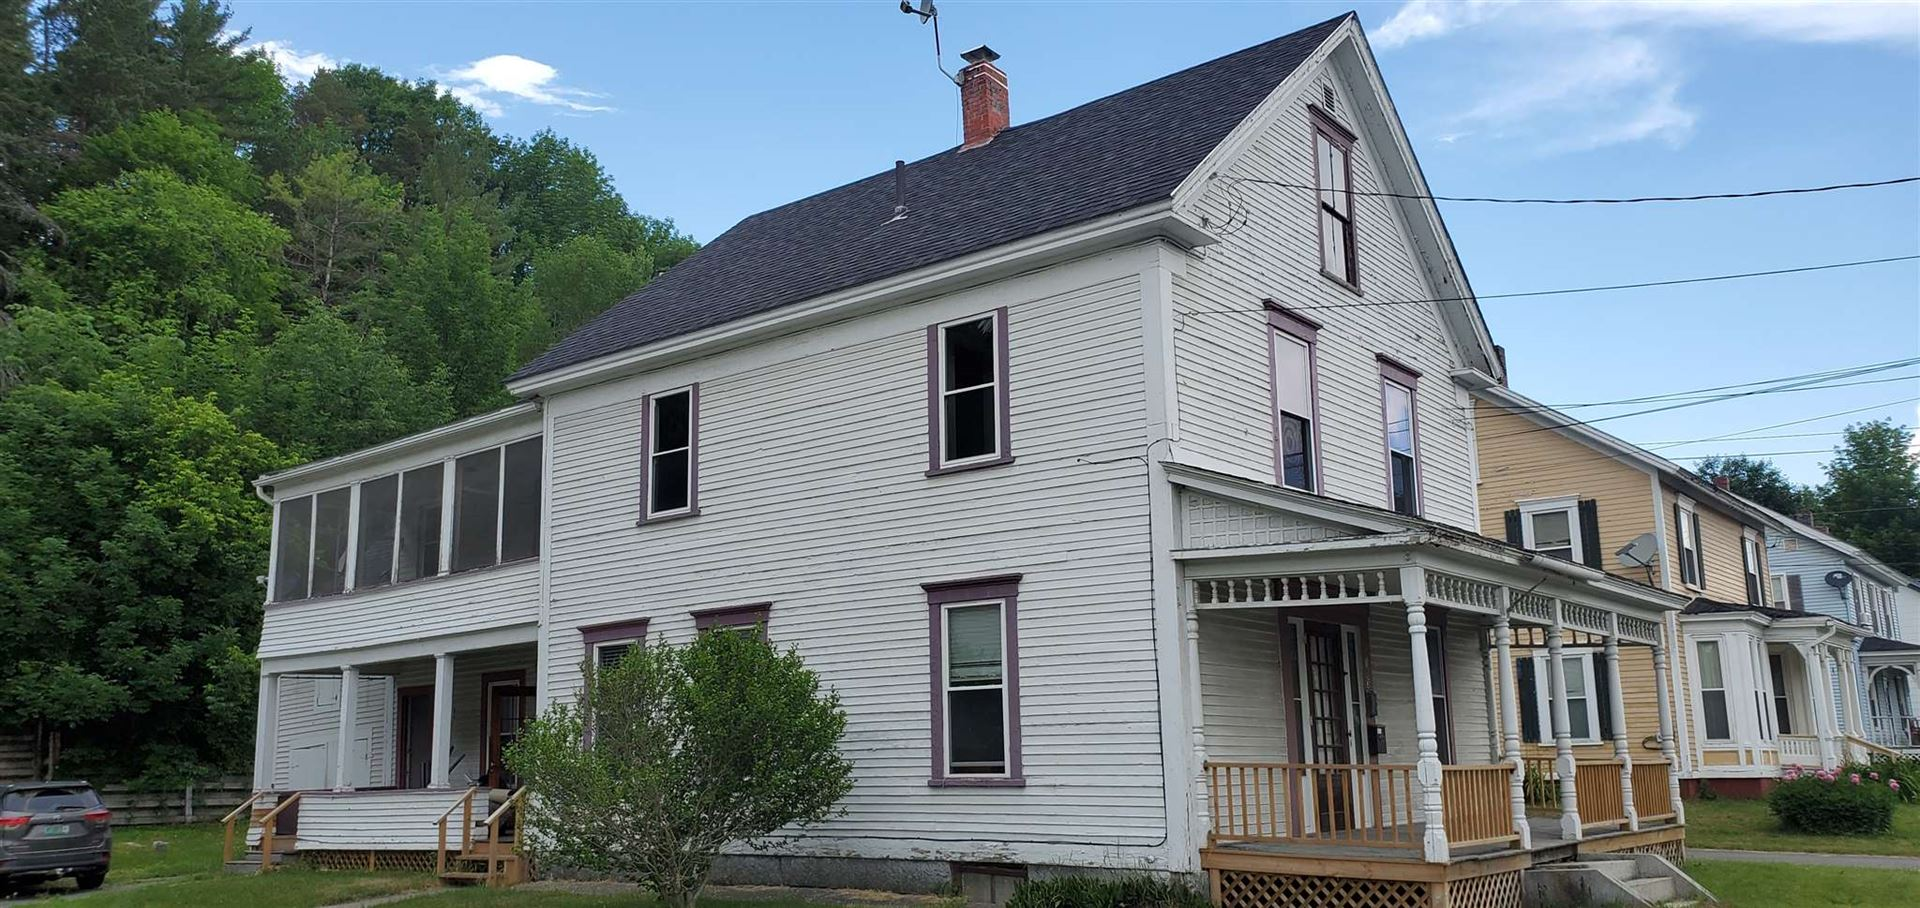 183 Pearl Street, Saint Johnsbury, VT 05819 - MLS#: 4812480